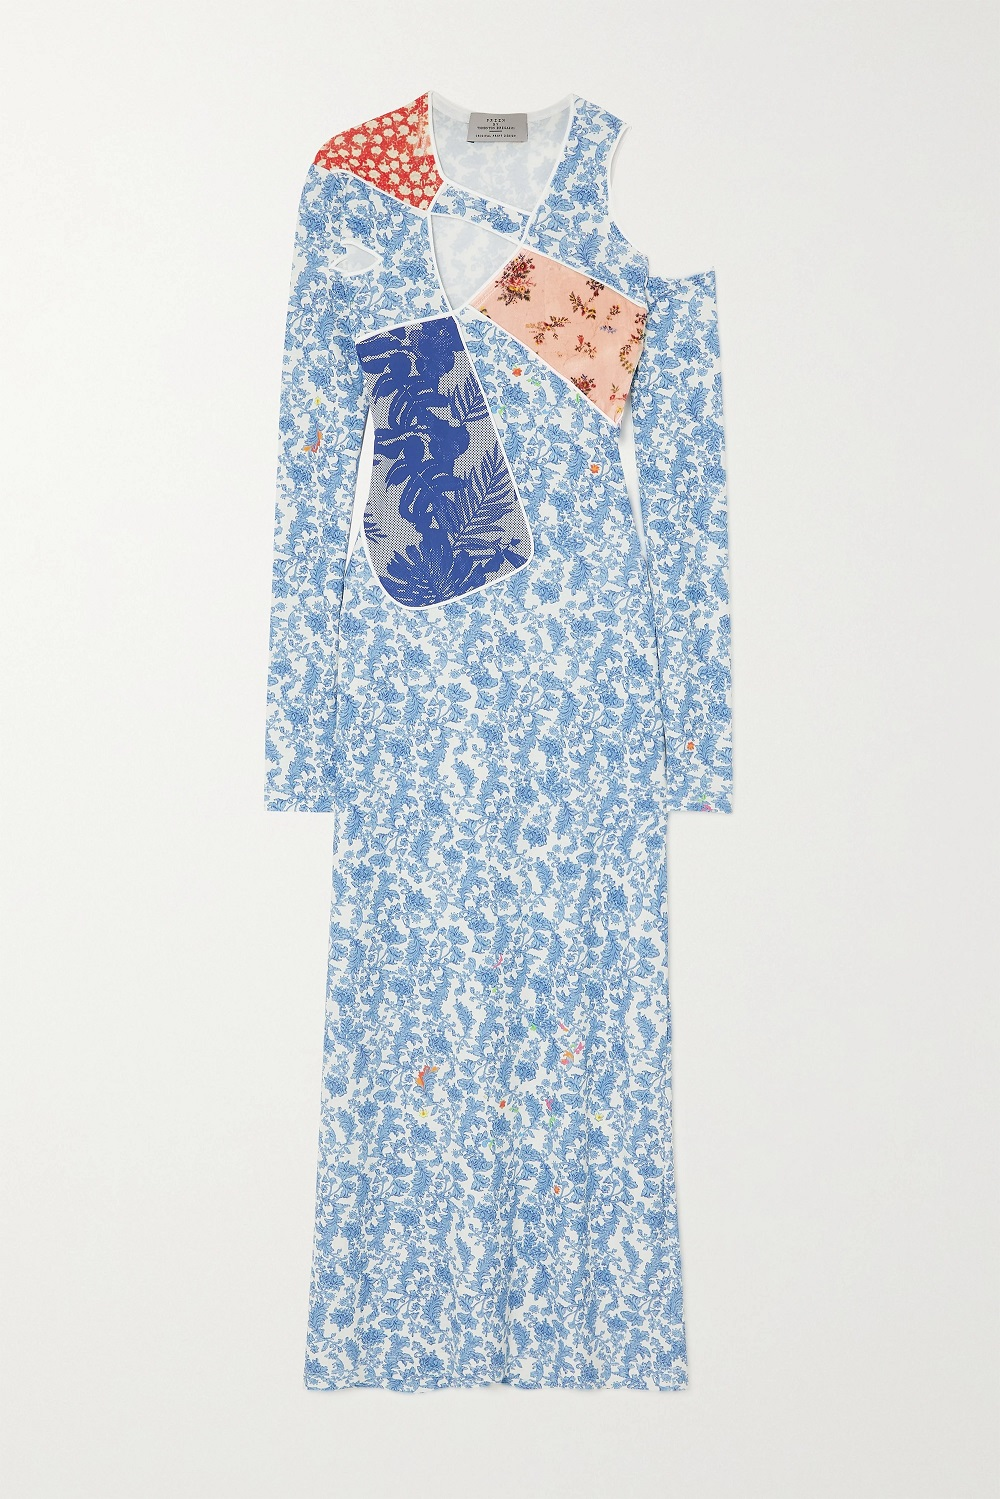 Preen by Thornton Bregazzi midi haljina proljeće/ljeto 2021.